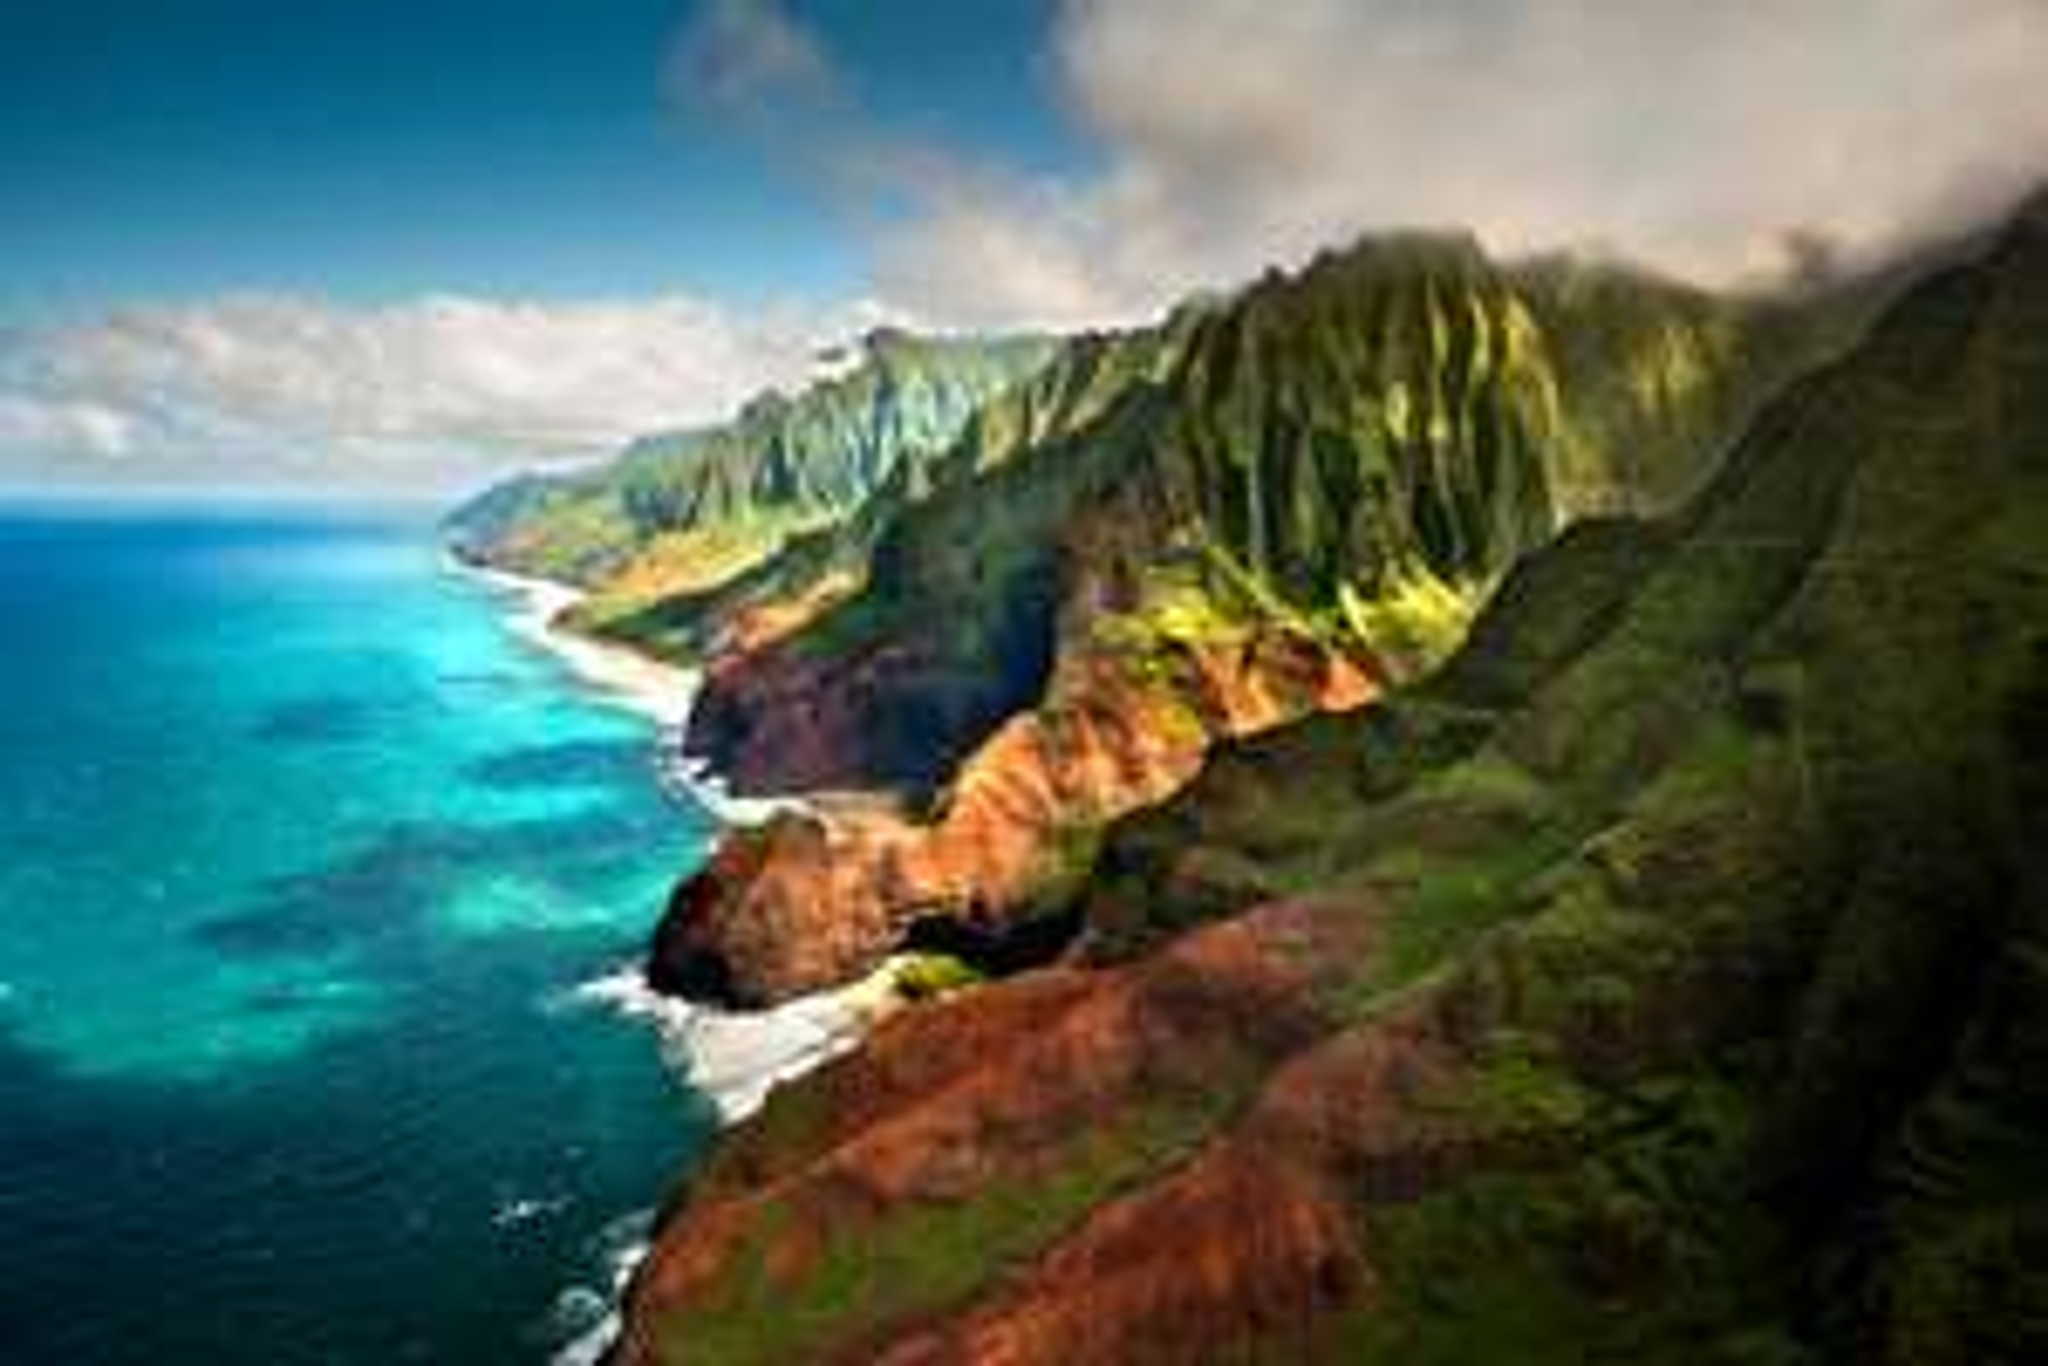 [August - Februar] Hin- und Rückflüge von Amsterdam, Venedig oder Mailand nach Hawaii (Honolulu, Kahului, Lihue oder Kona) ab 385€